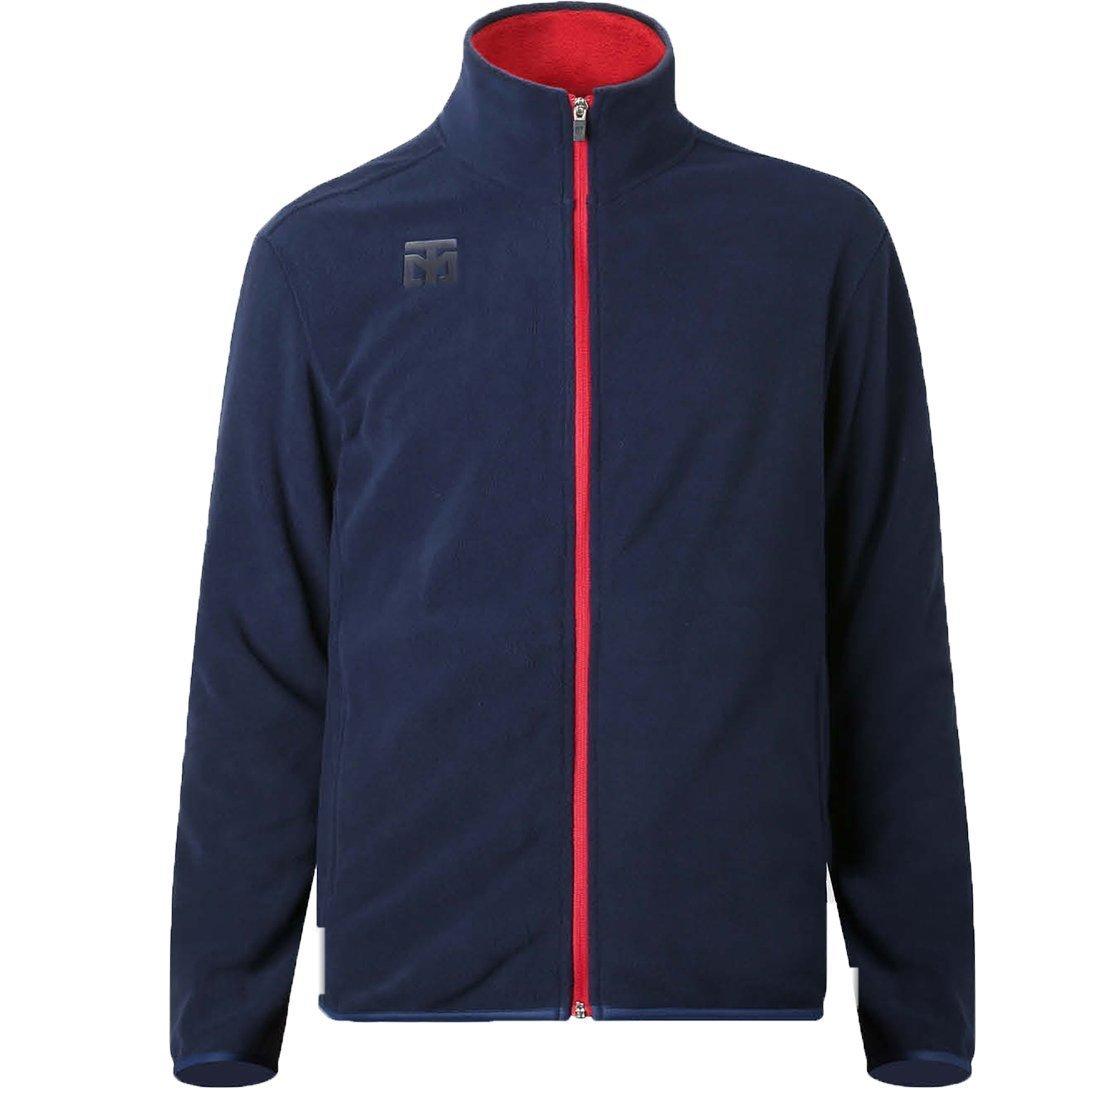 MOOTO Fleece Zip-up フリースジップアップジャケットウィンタートレーニングネイビー B07B6MVTSD  150cm(4.92ft)